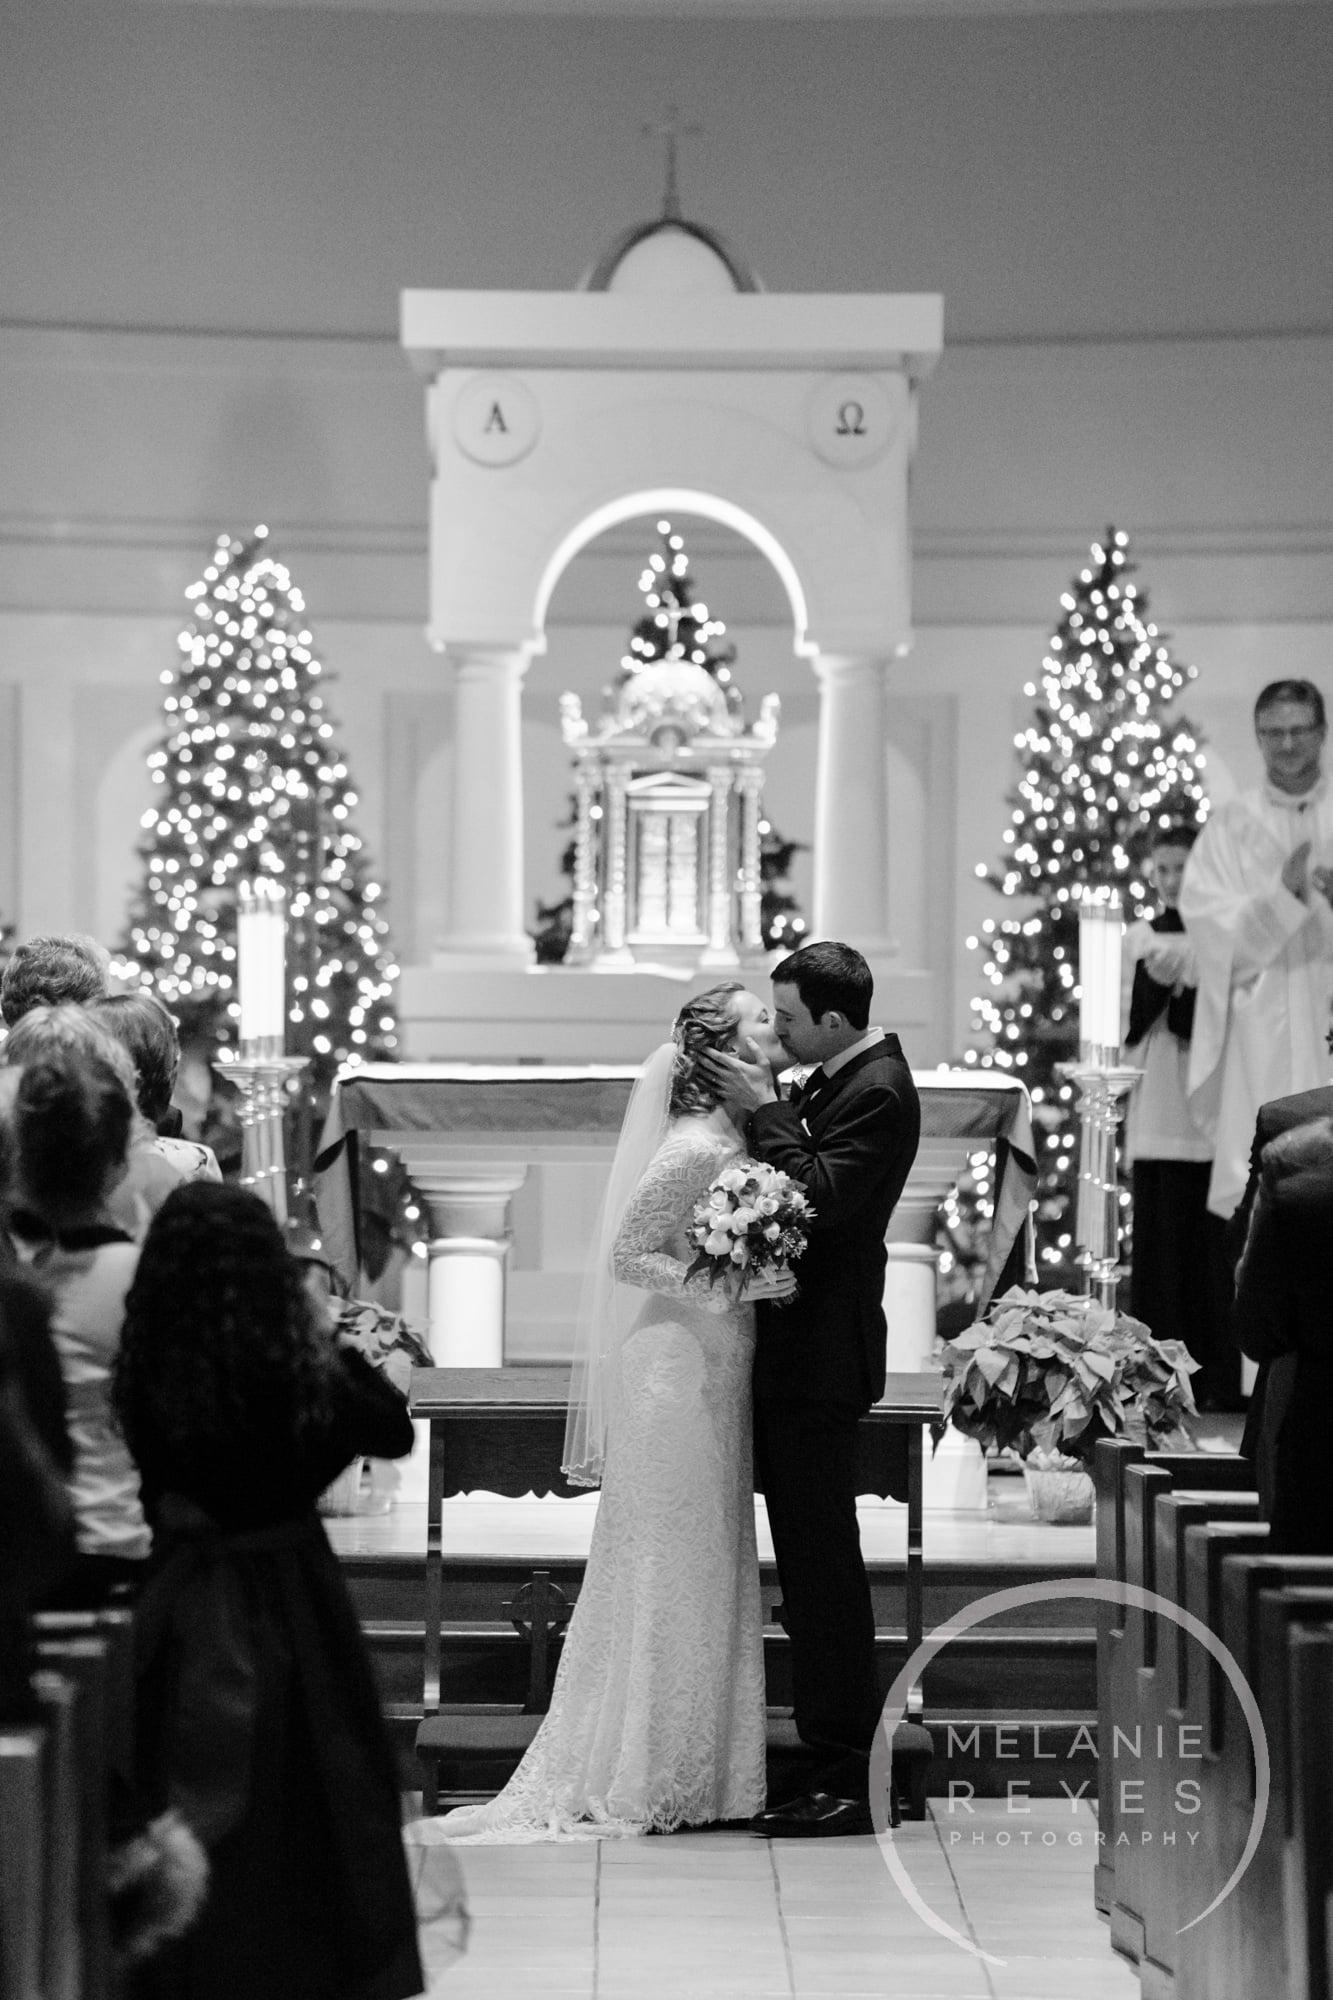 2015_ann_arbor_wedding_photographer_melaniereyes_032.JPG